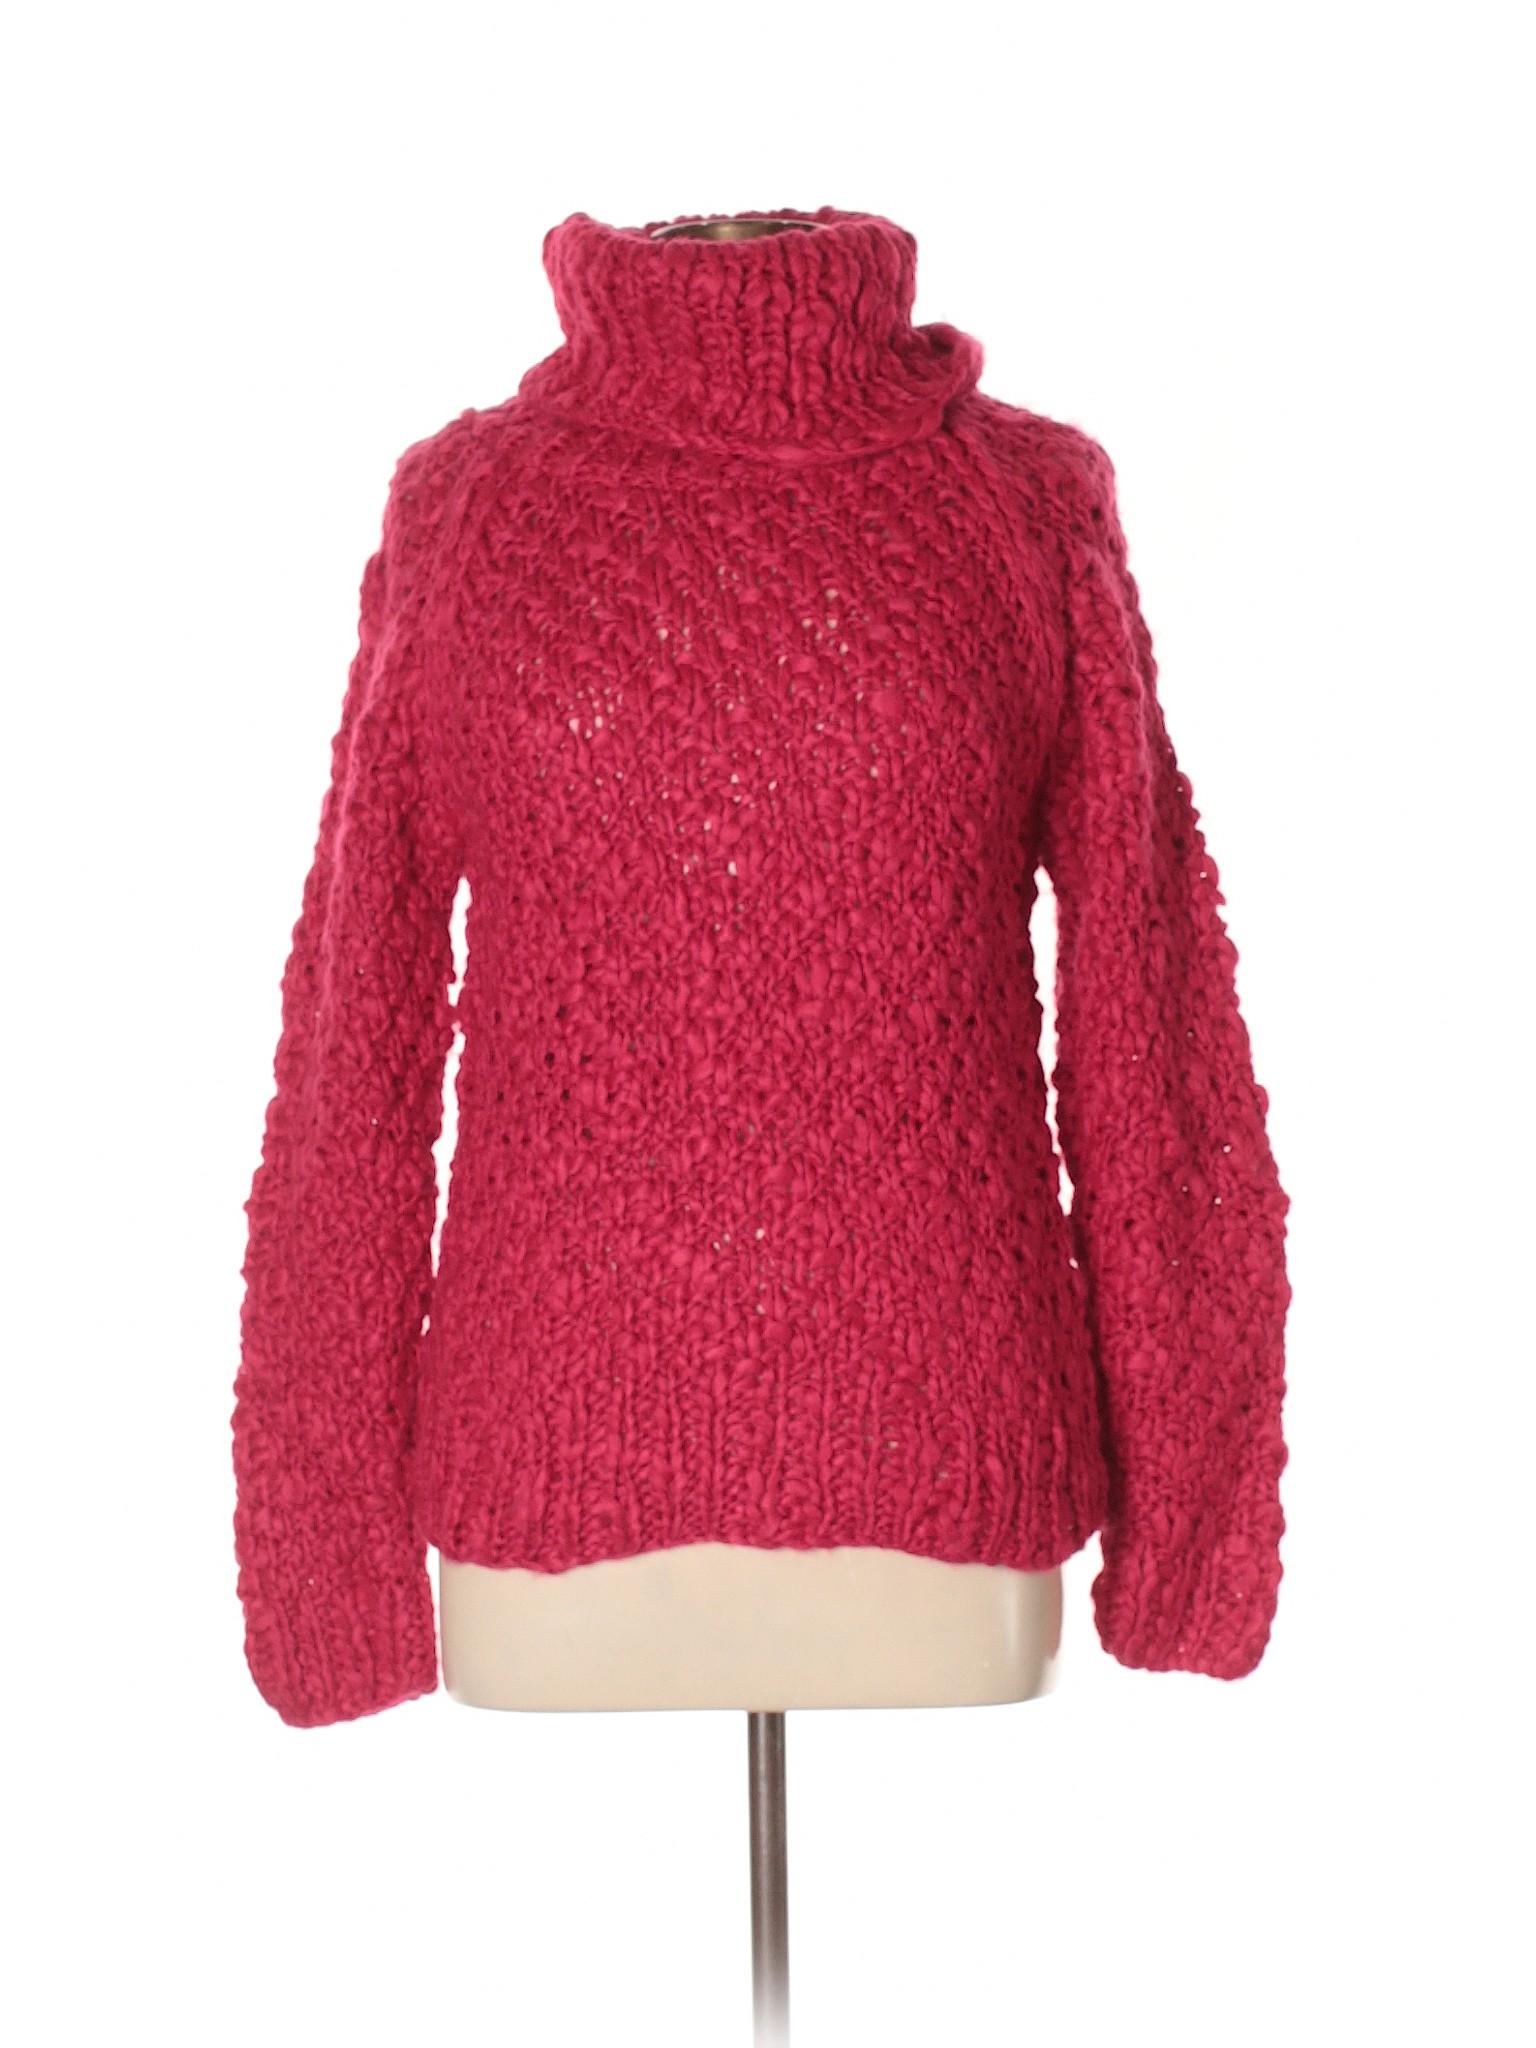 Boutique amp; Turtleneck Theodore Sweater Chelsea winter 44Pqw70